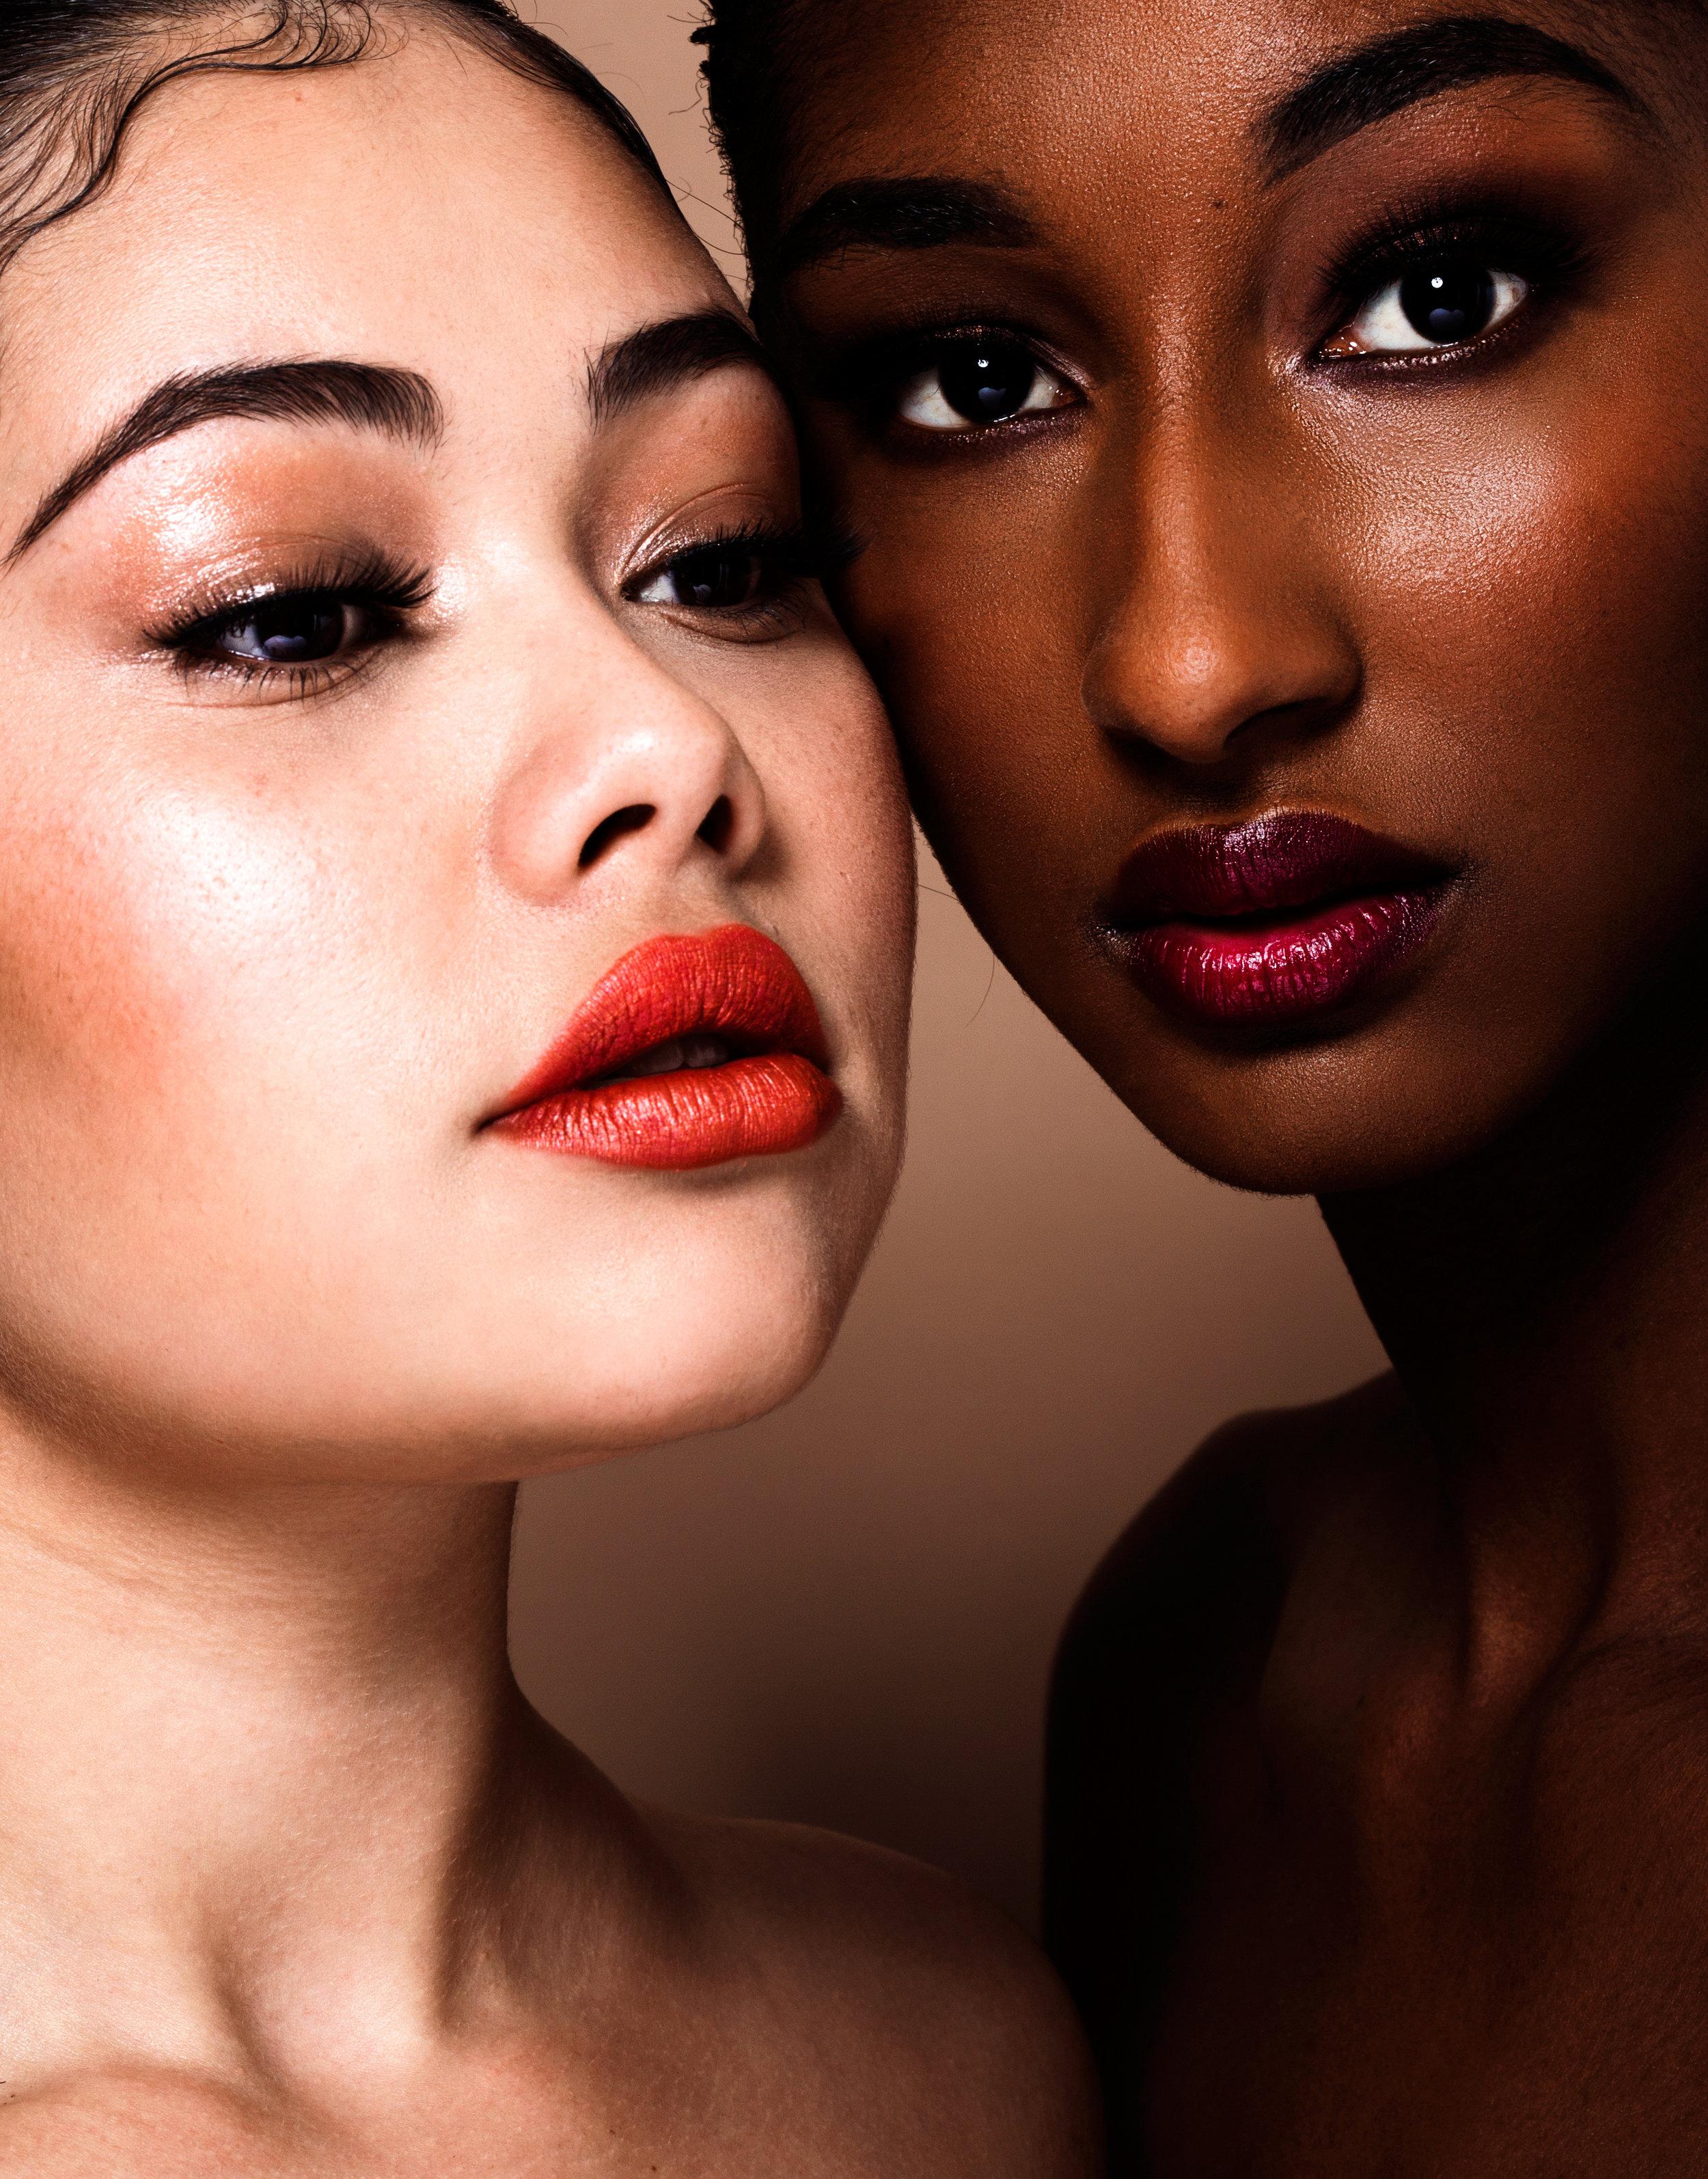 realher makeup x mocha girl beauty